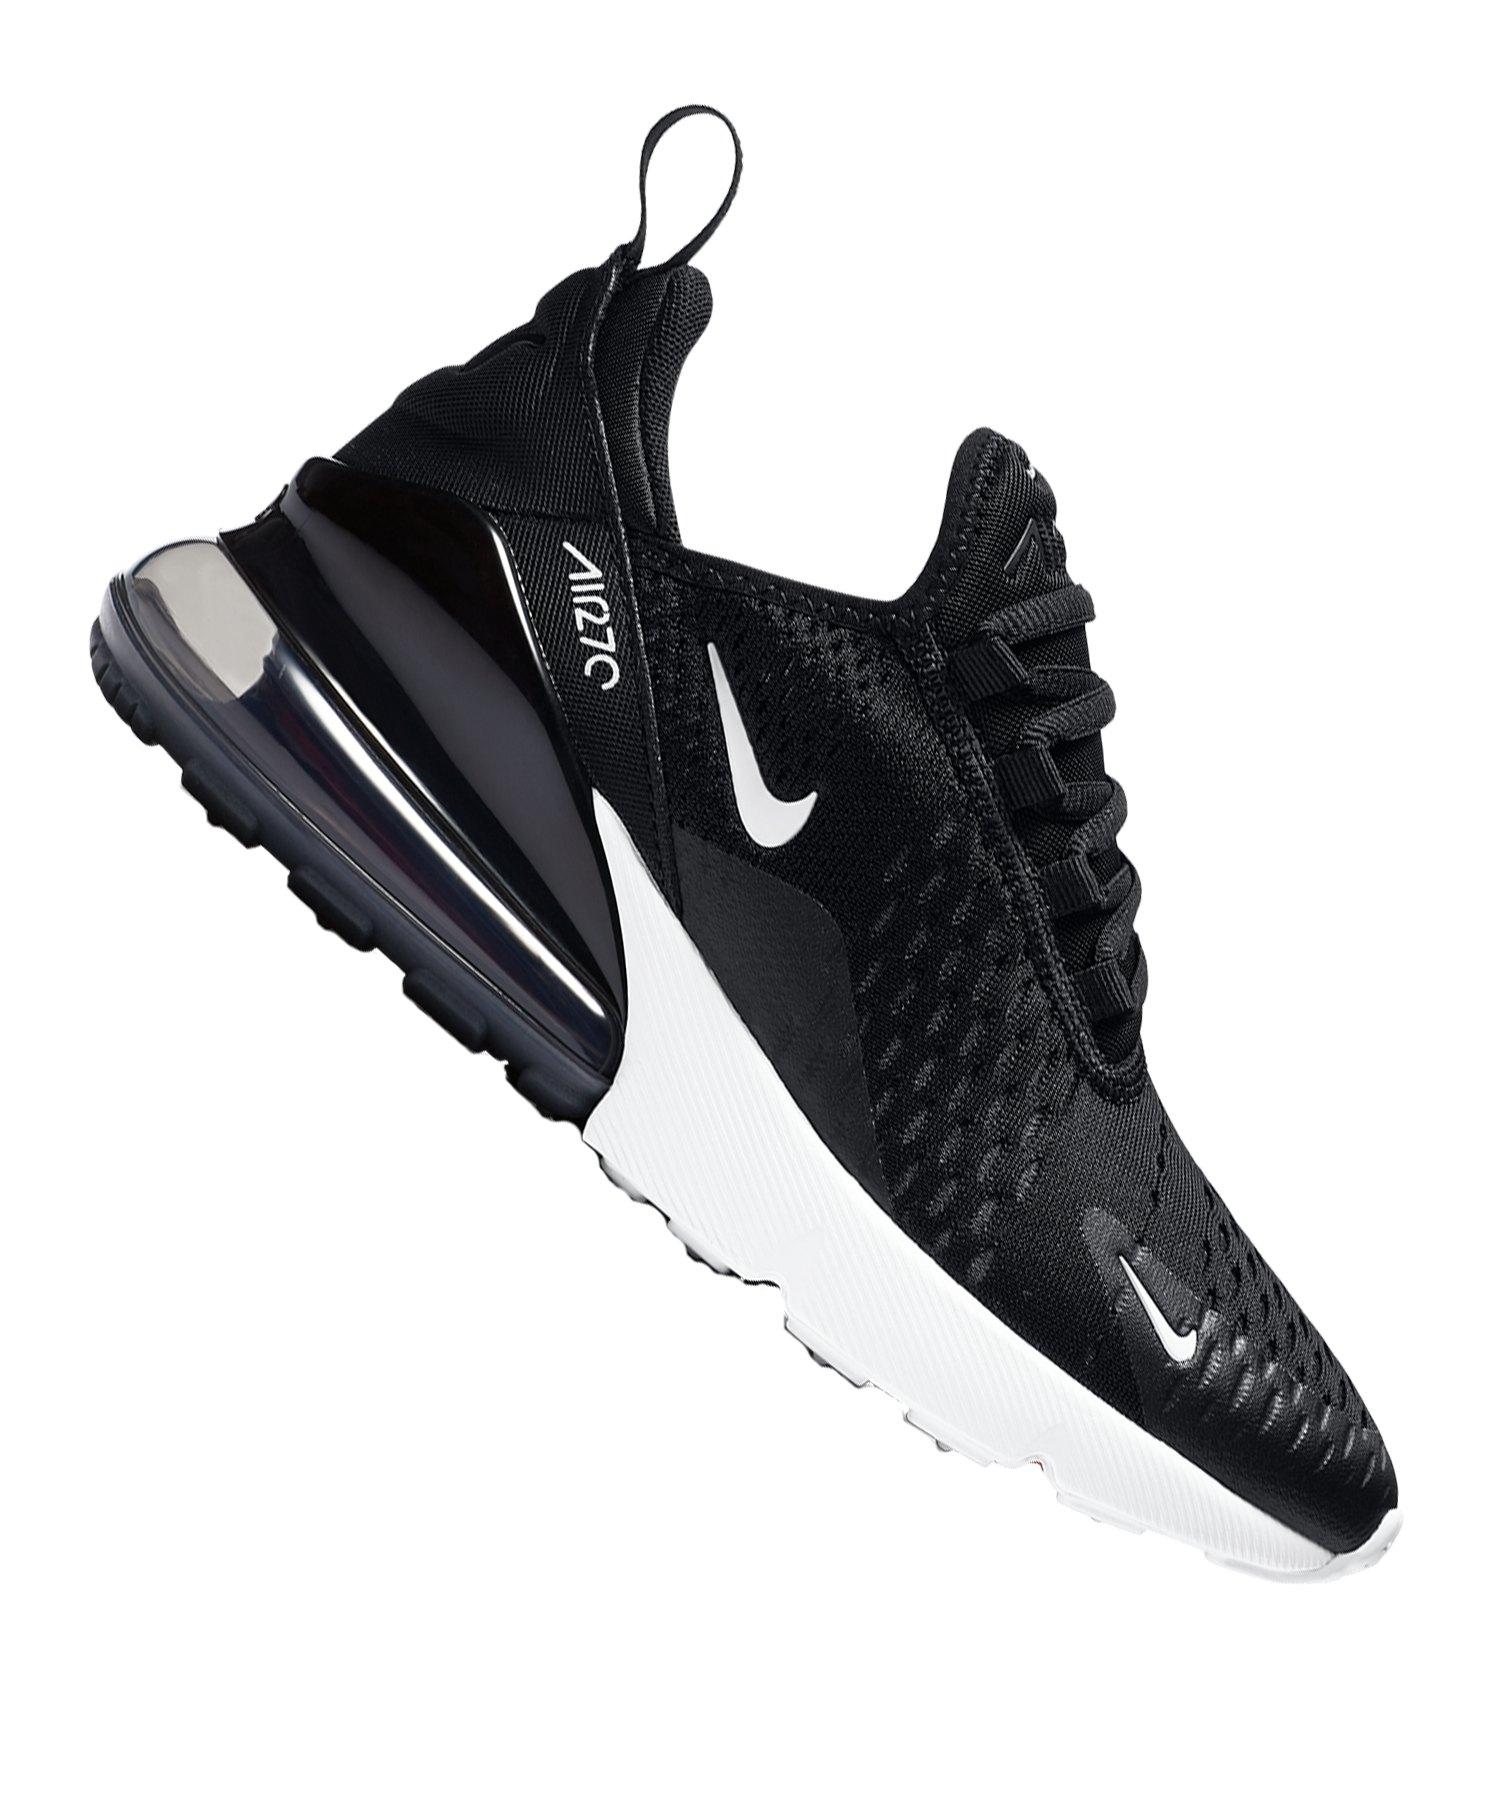 los angeles d9d78 d1add Nike Air Max 270 Sneaker Kids Schwarz F001 - Schwarz